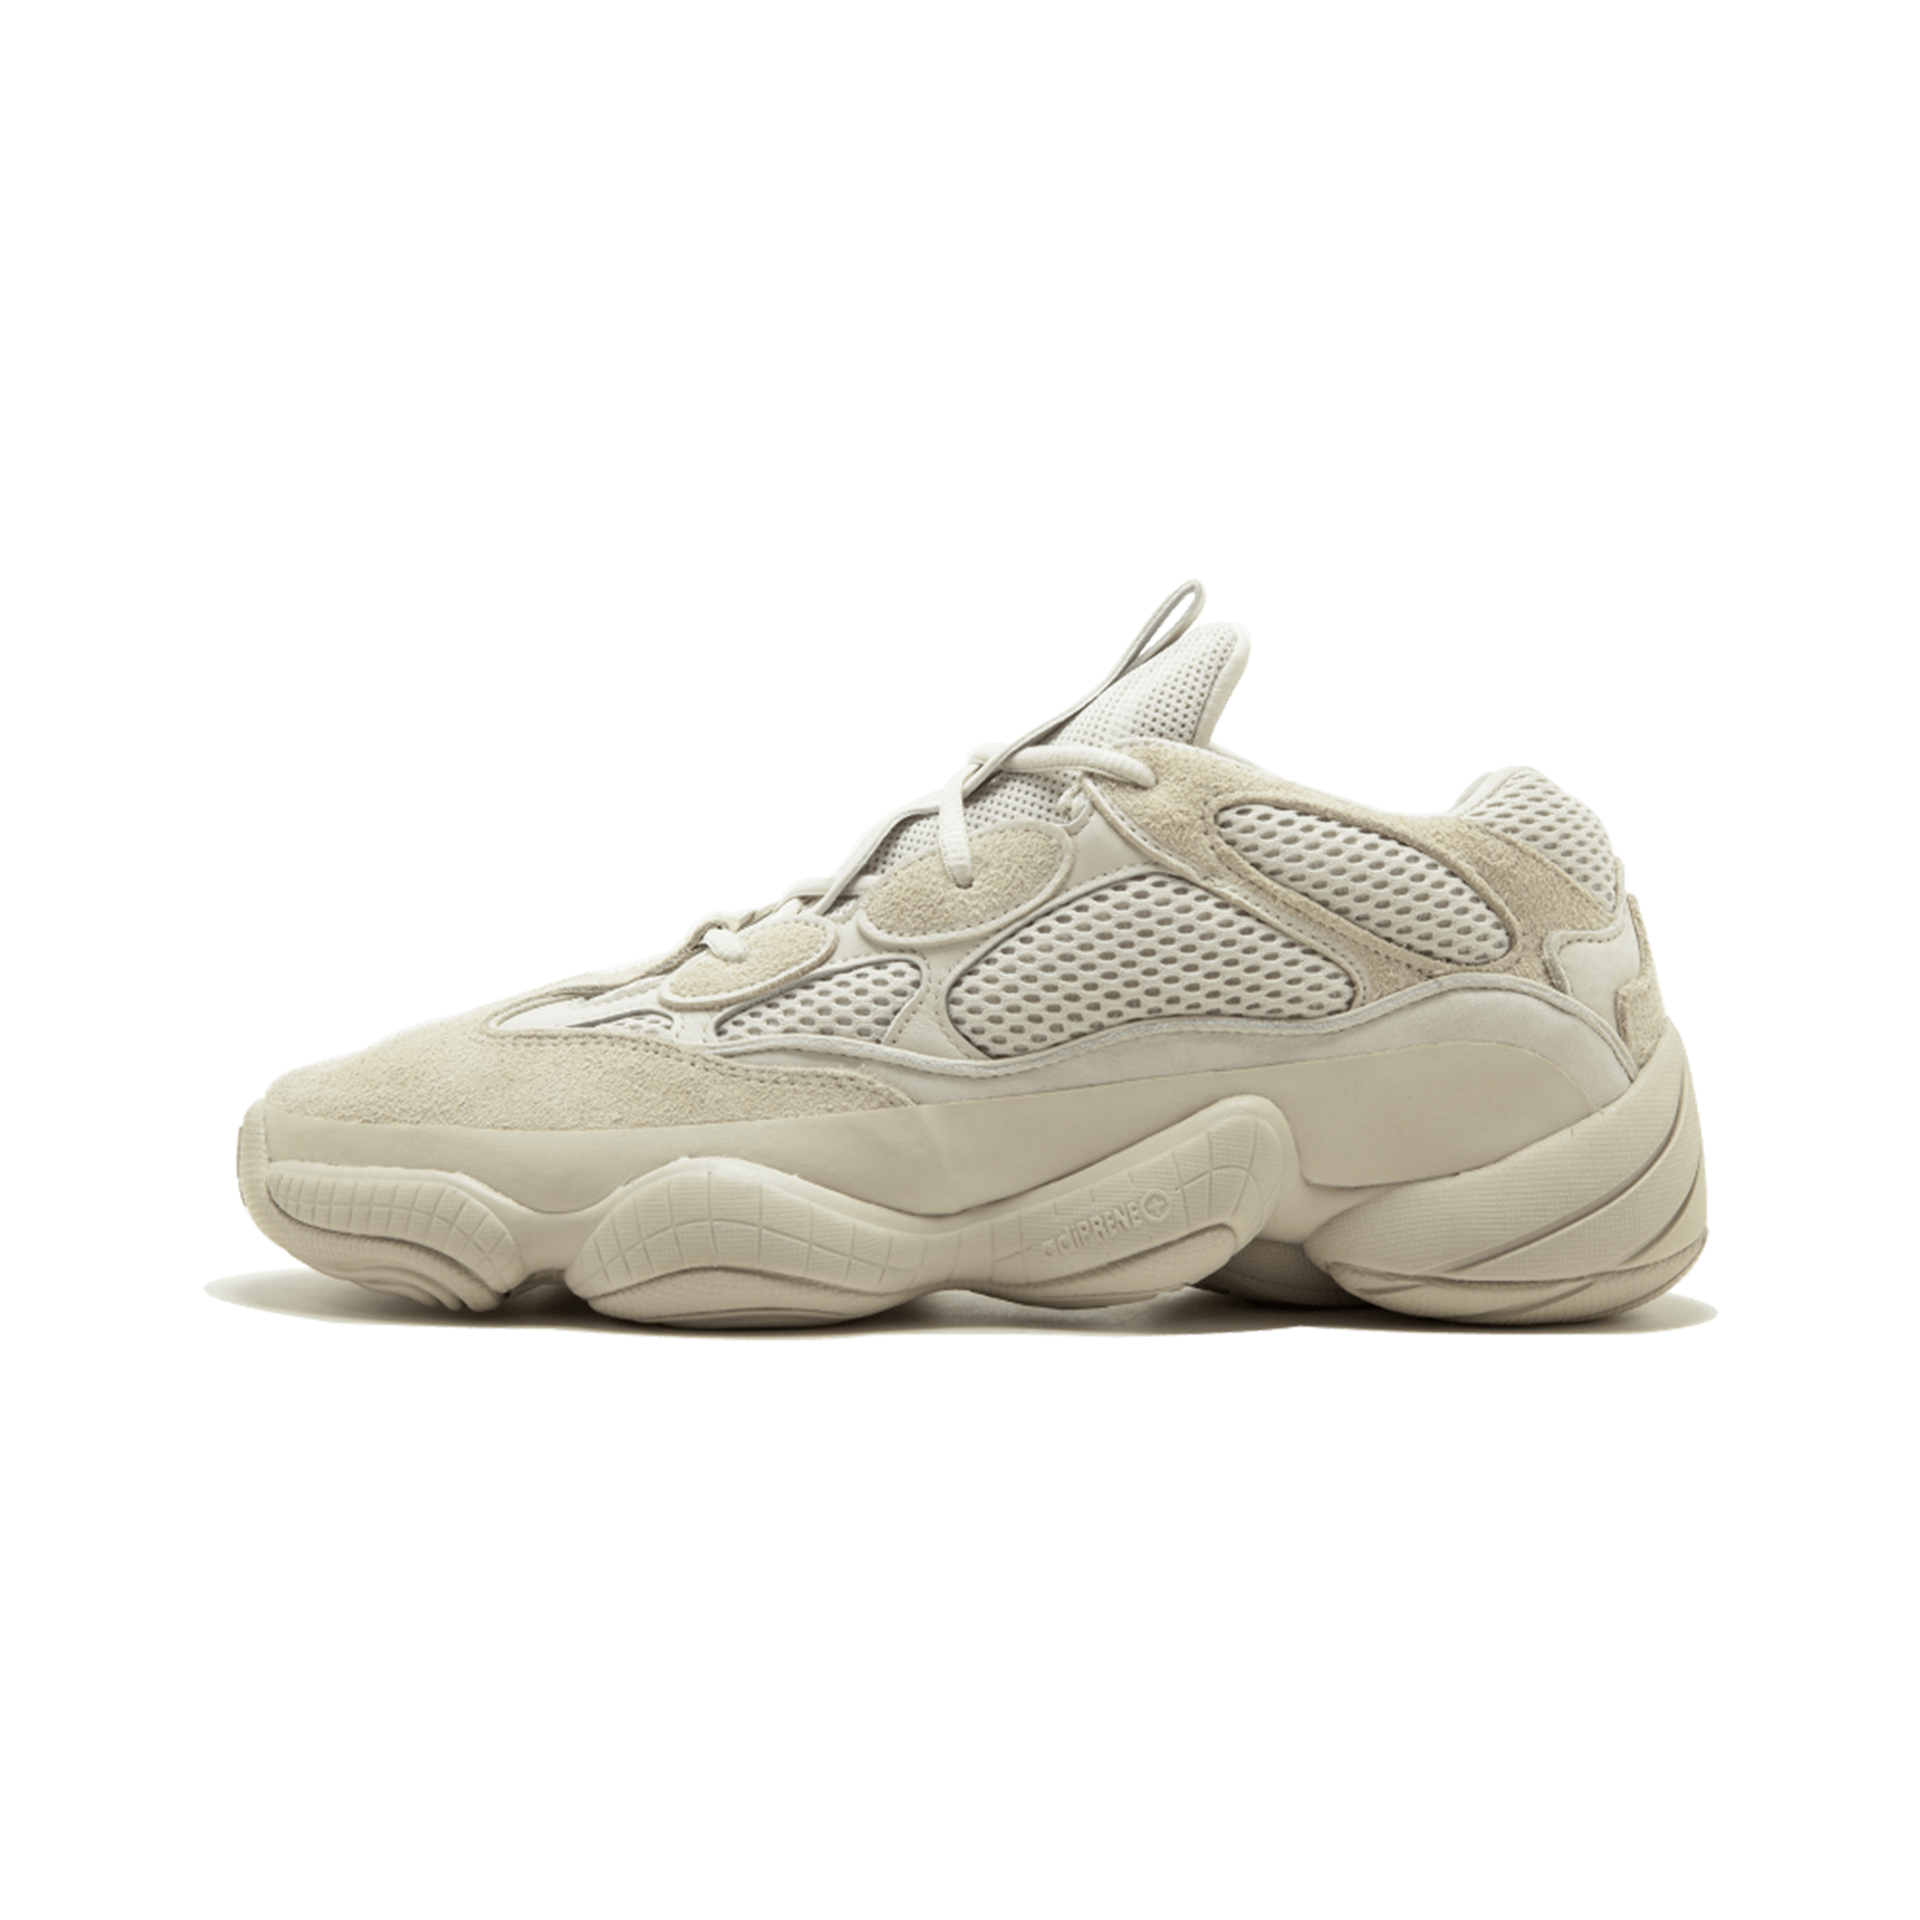 Home>Sneakers>ADIDAS YEEZY 500 DESERT RAT BLUSH